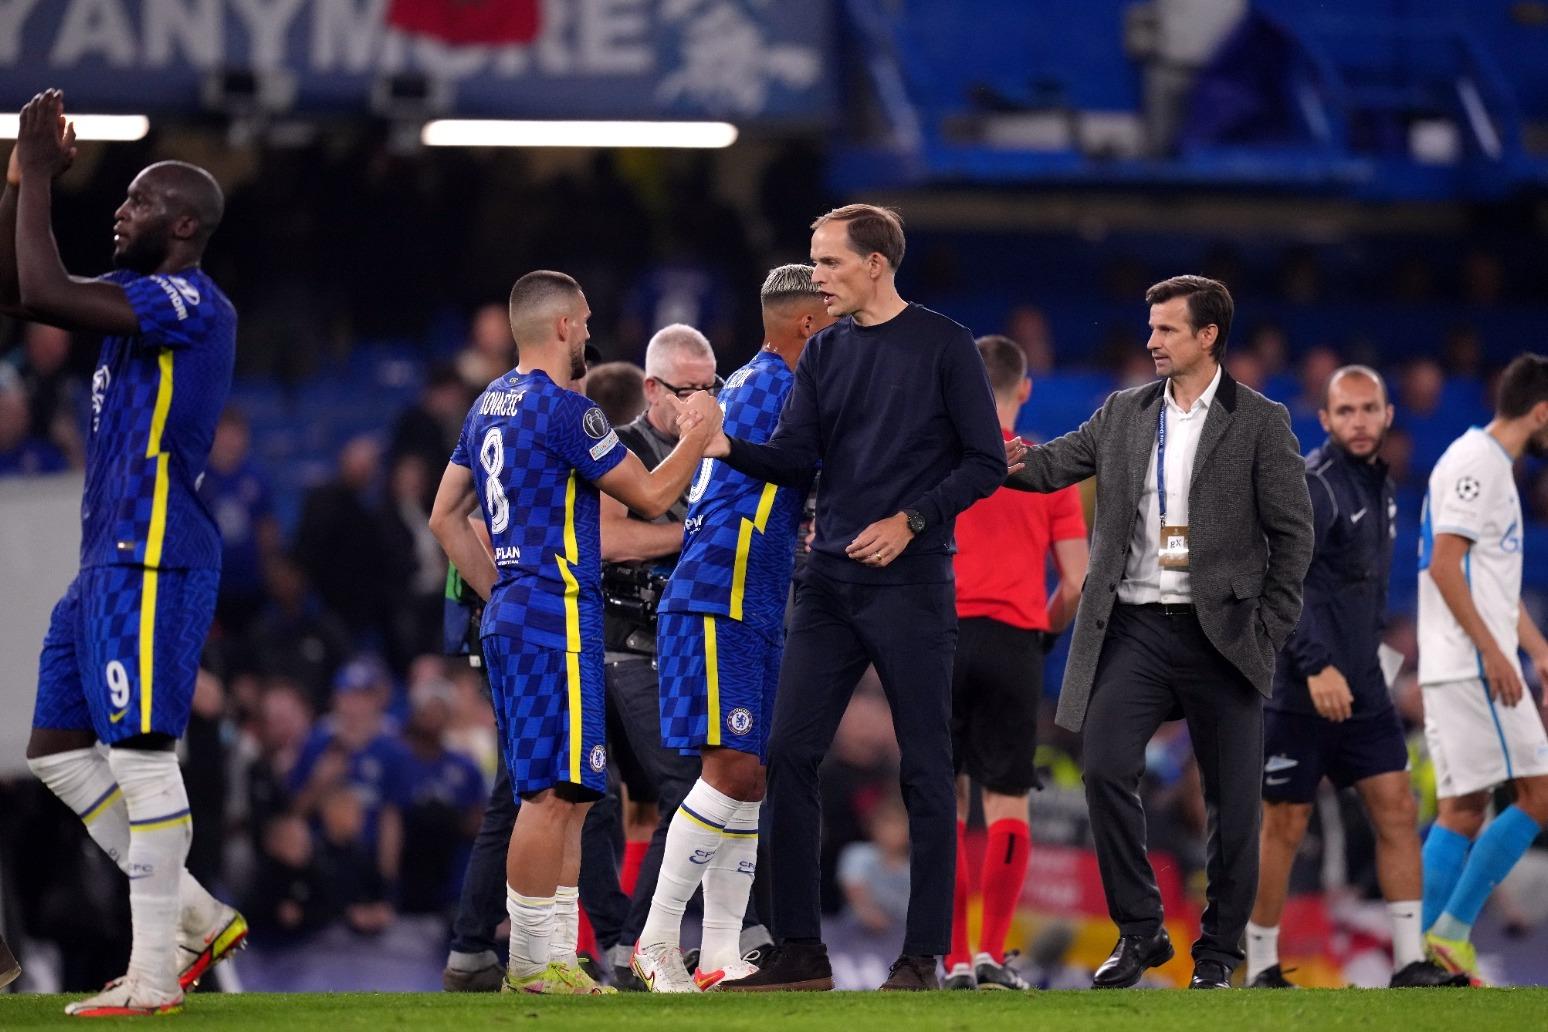 Thomas Tuchel praises 'world-class' Romelu Lukaku after narrow Chelsea victory